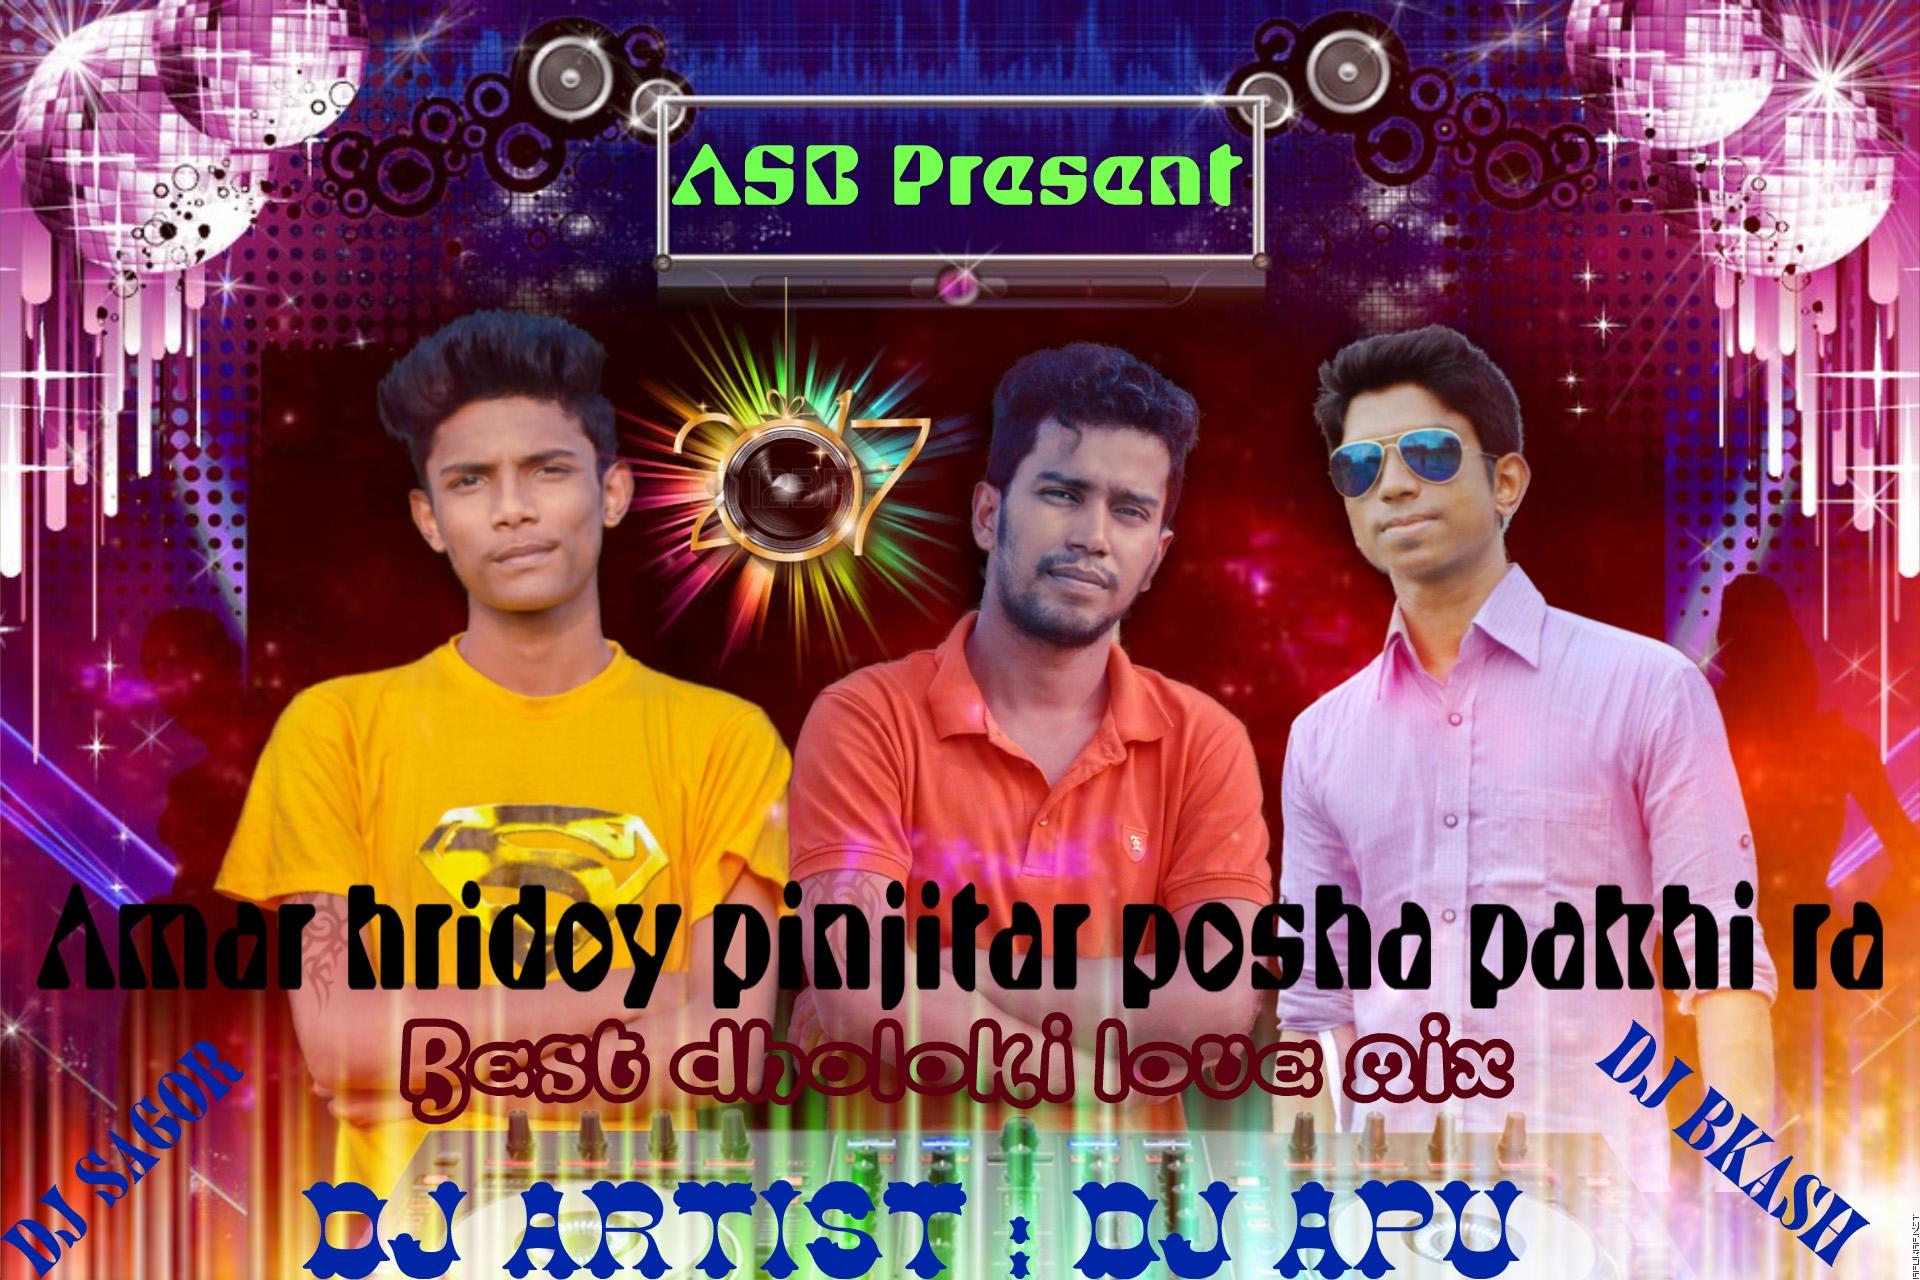 Amar Hridoy PinJirar Pusha Pakhi Re (Best DholkiLove Mix) Dj Apu & Dj Bikash-Sagor [ApuWap.Net].mp3